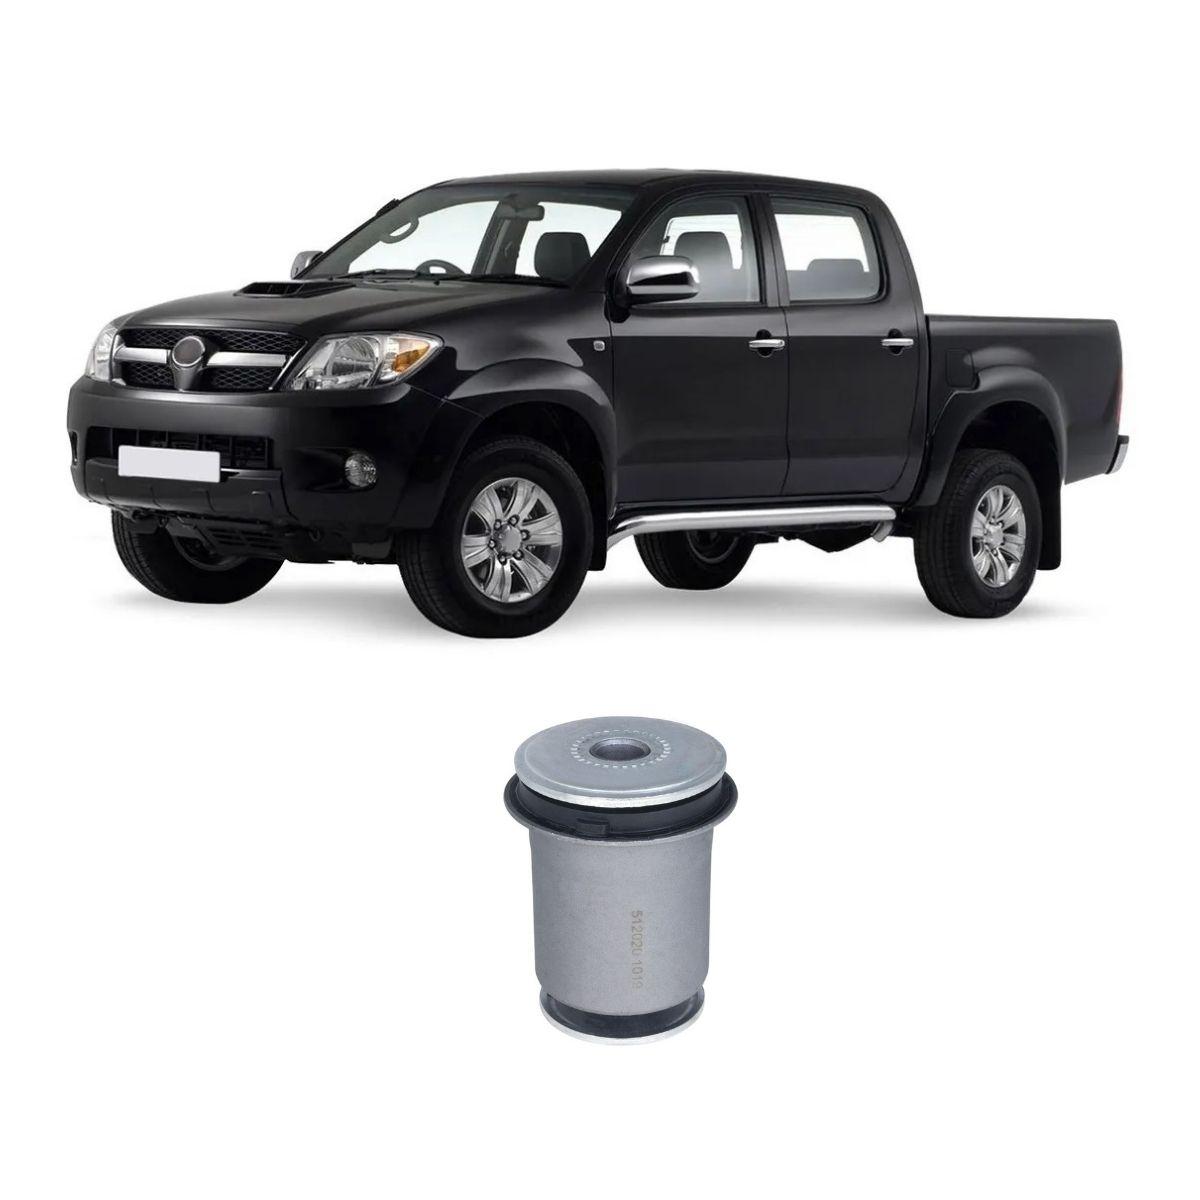 Bucha Da Bandeja Inferior Dianteira Toyota Hilux 2005/2015